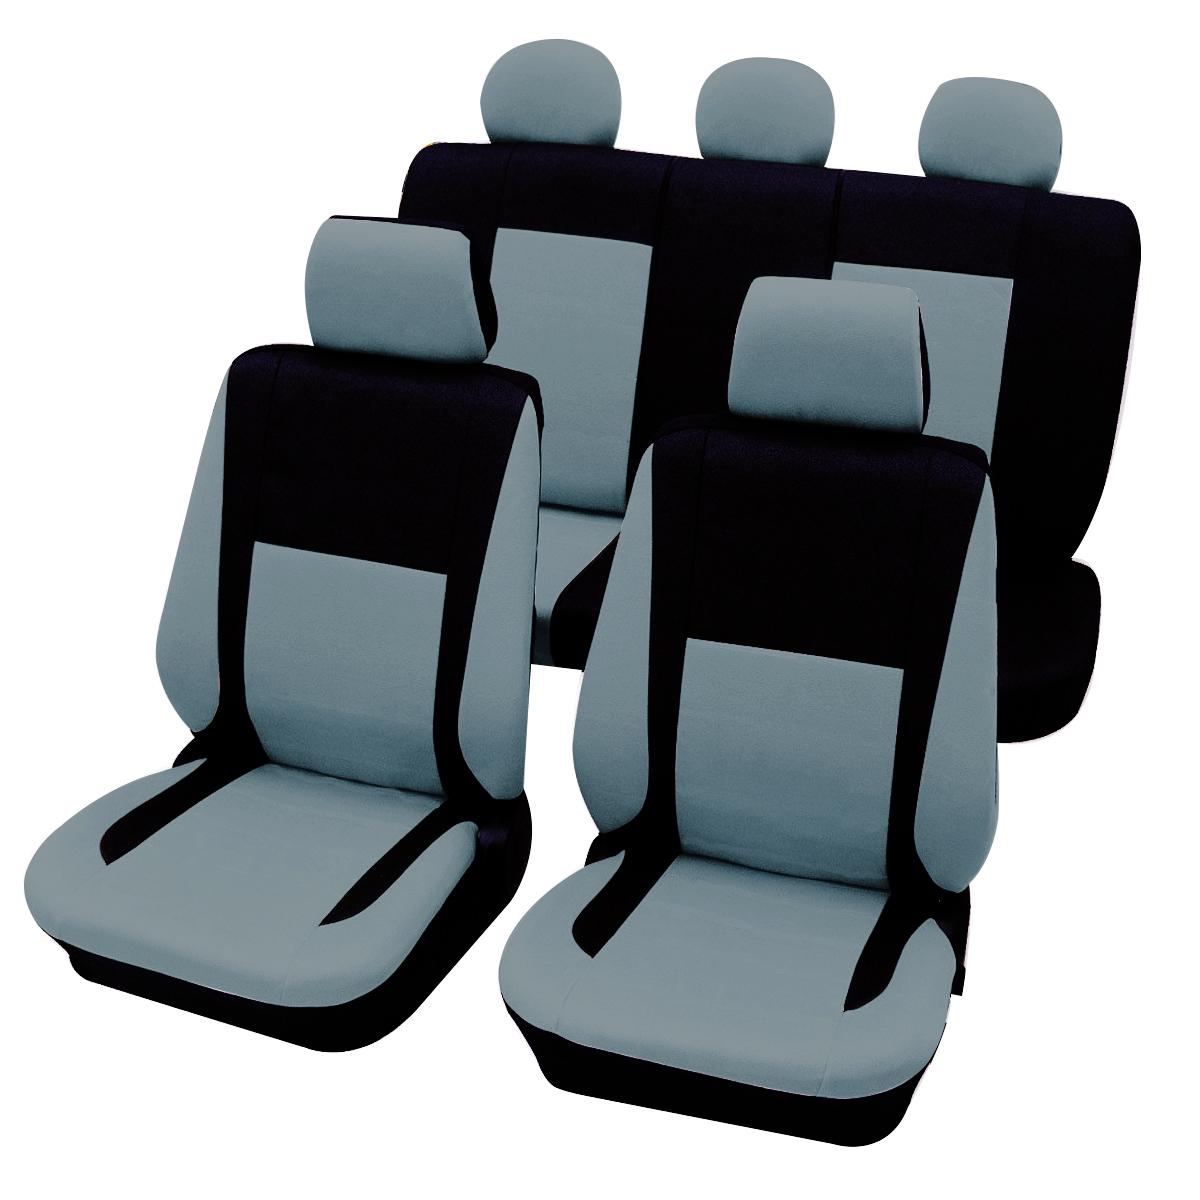 sitzbez ge auto schonbez ge sitzbezug schonbezug universal schoner farbwahl 282 ebay. Black Bedroom Furniture Sets. Home Design Ideas